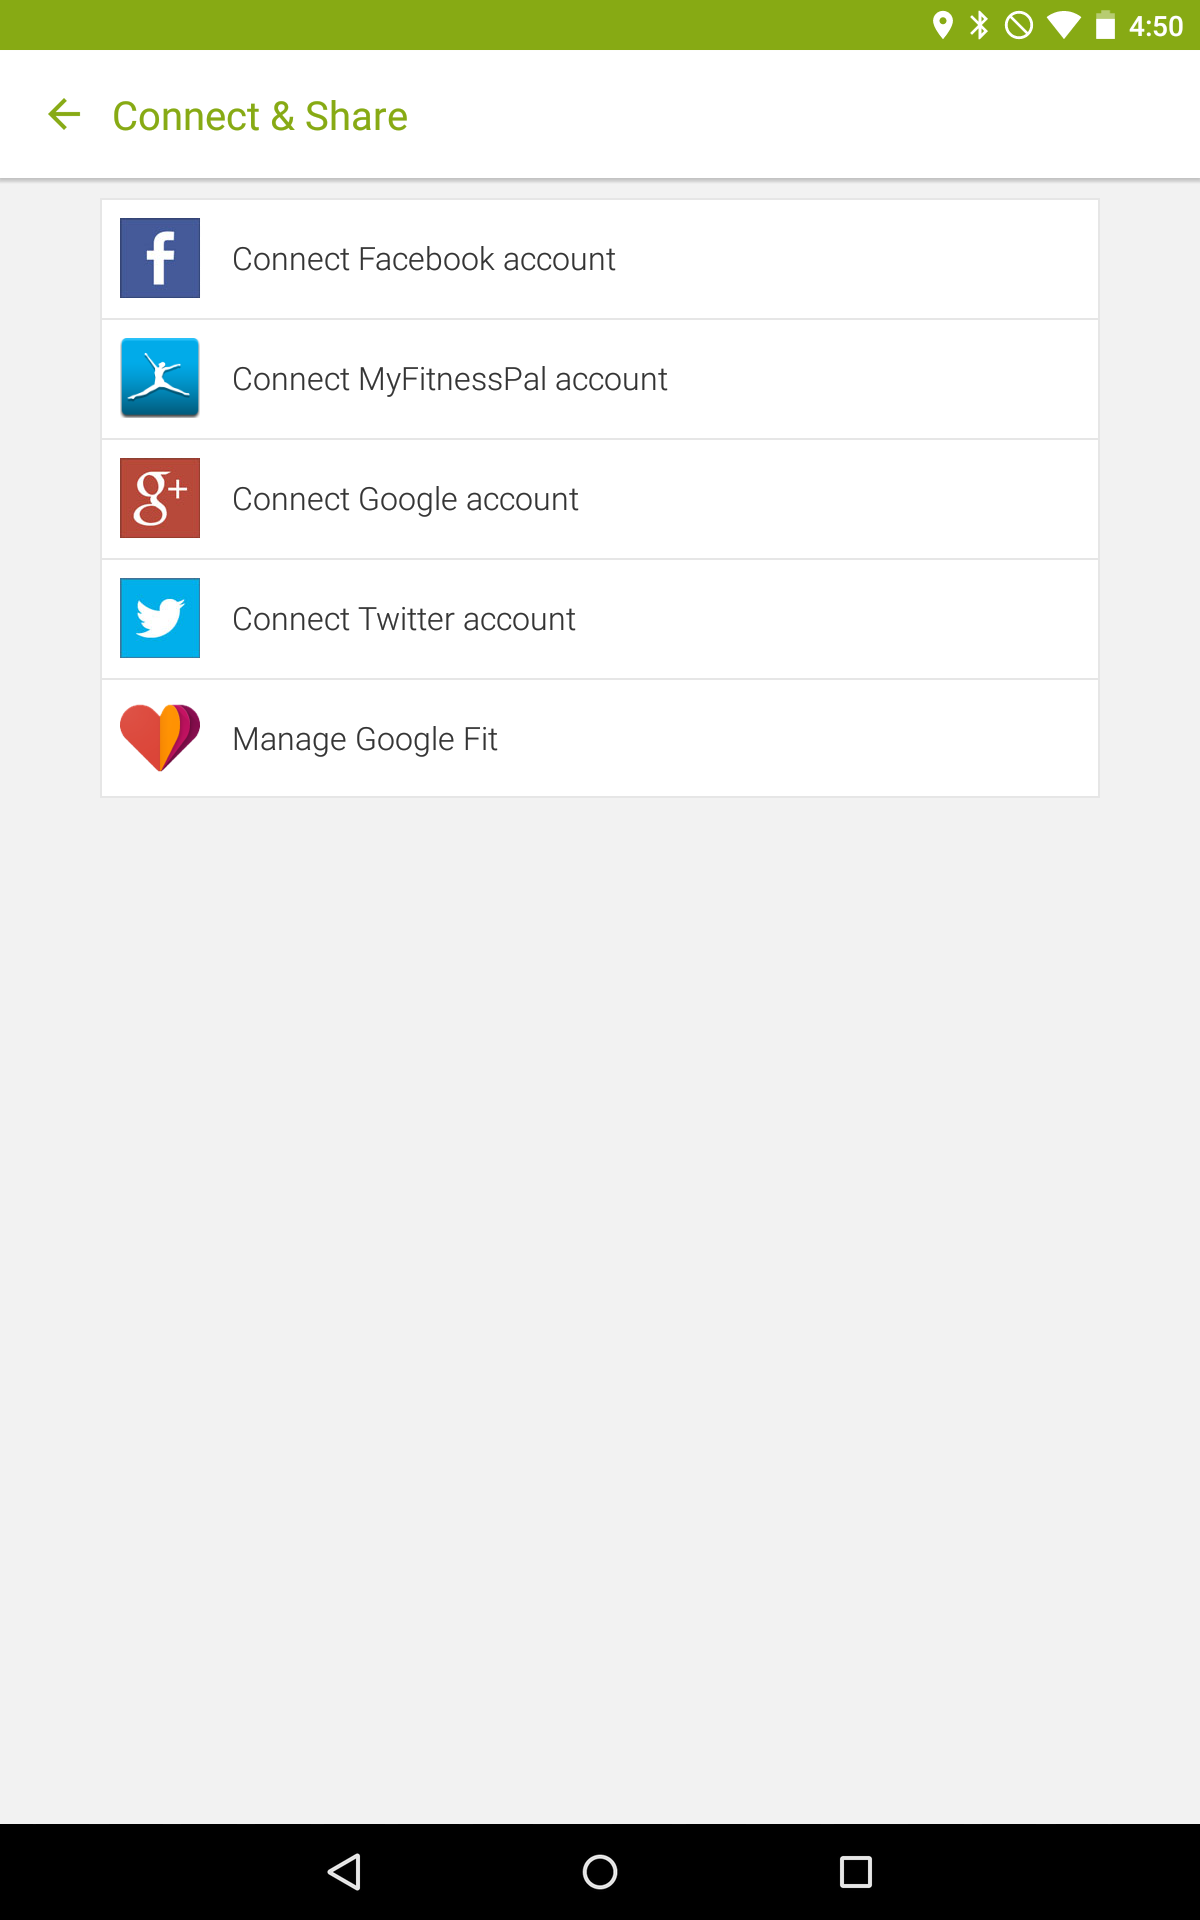 Endomondo Update Brings MyFitnessPal And Google Fit Integration